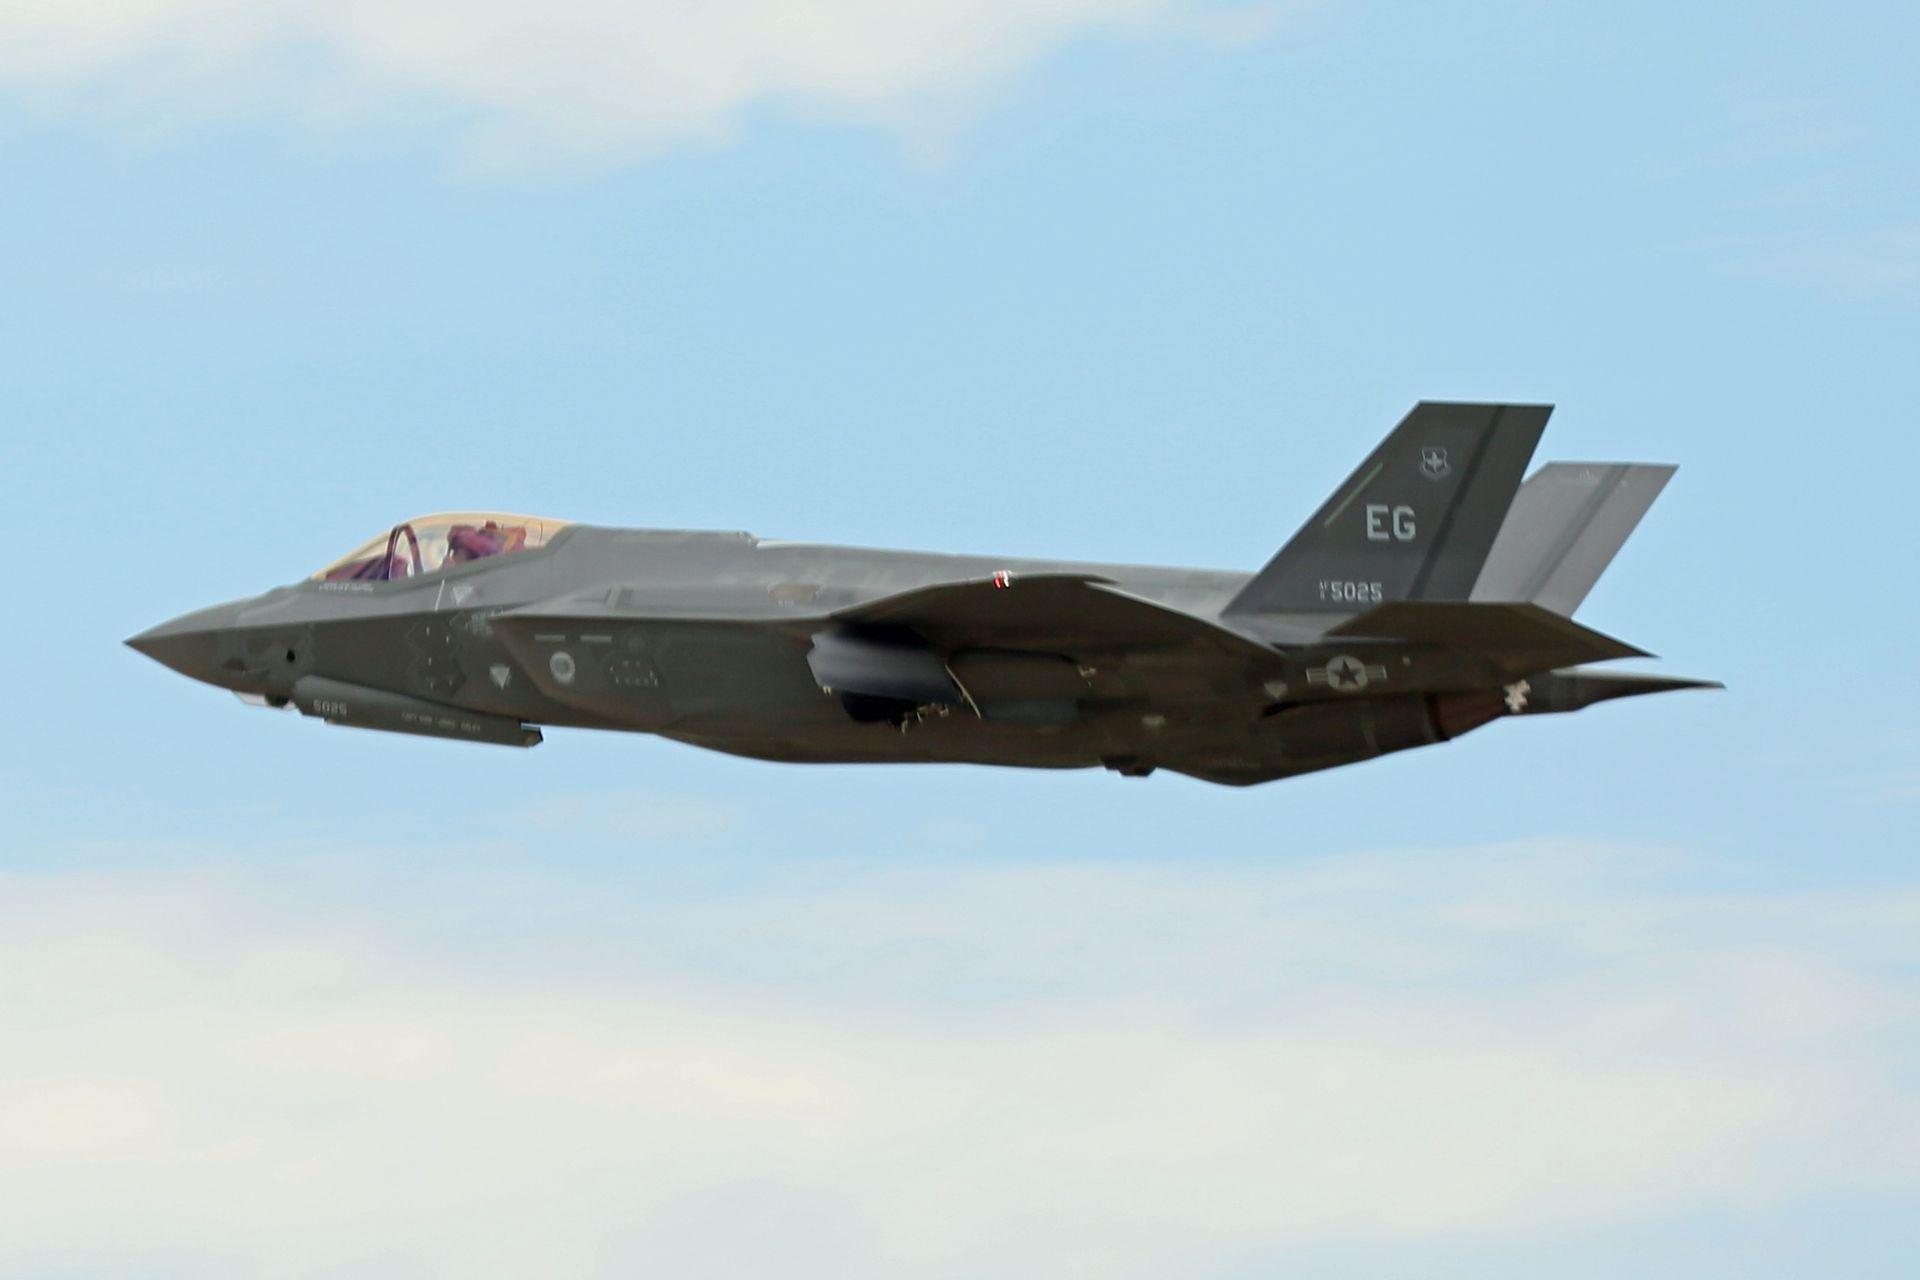 File:Lockheed Martin F-35A Lightning II, 11-5025 EG (cn AF